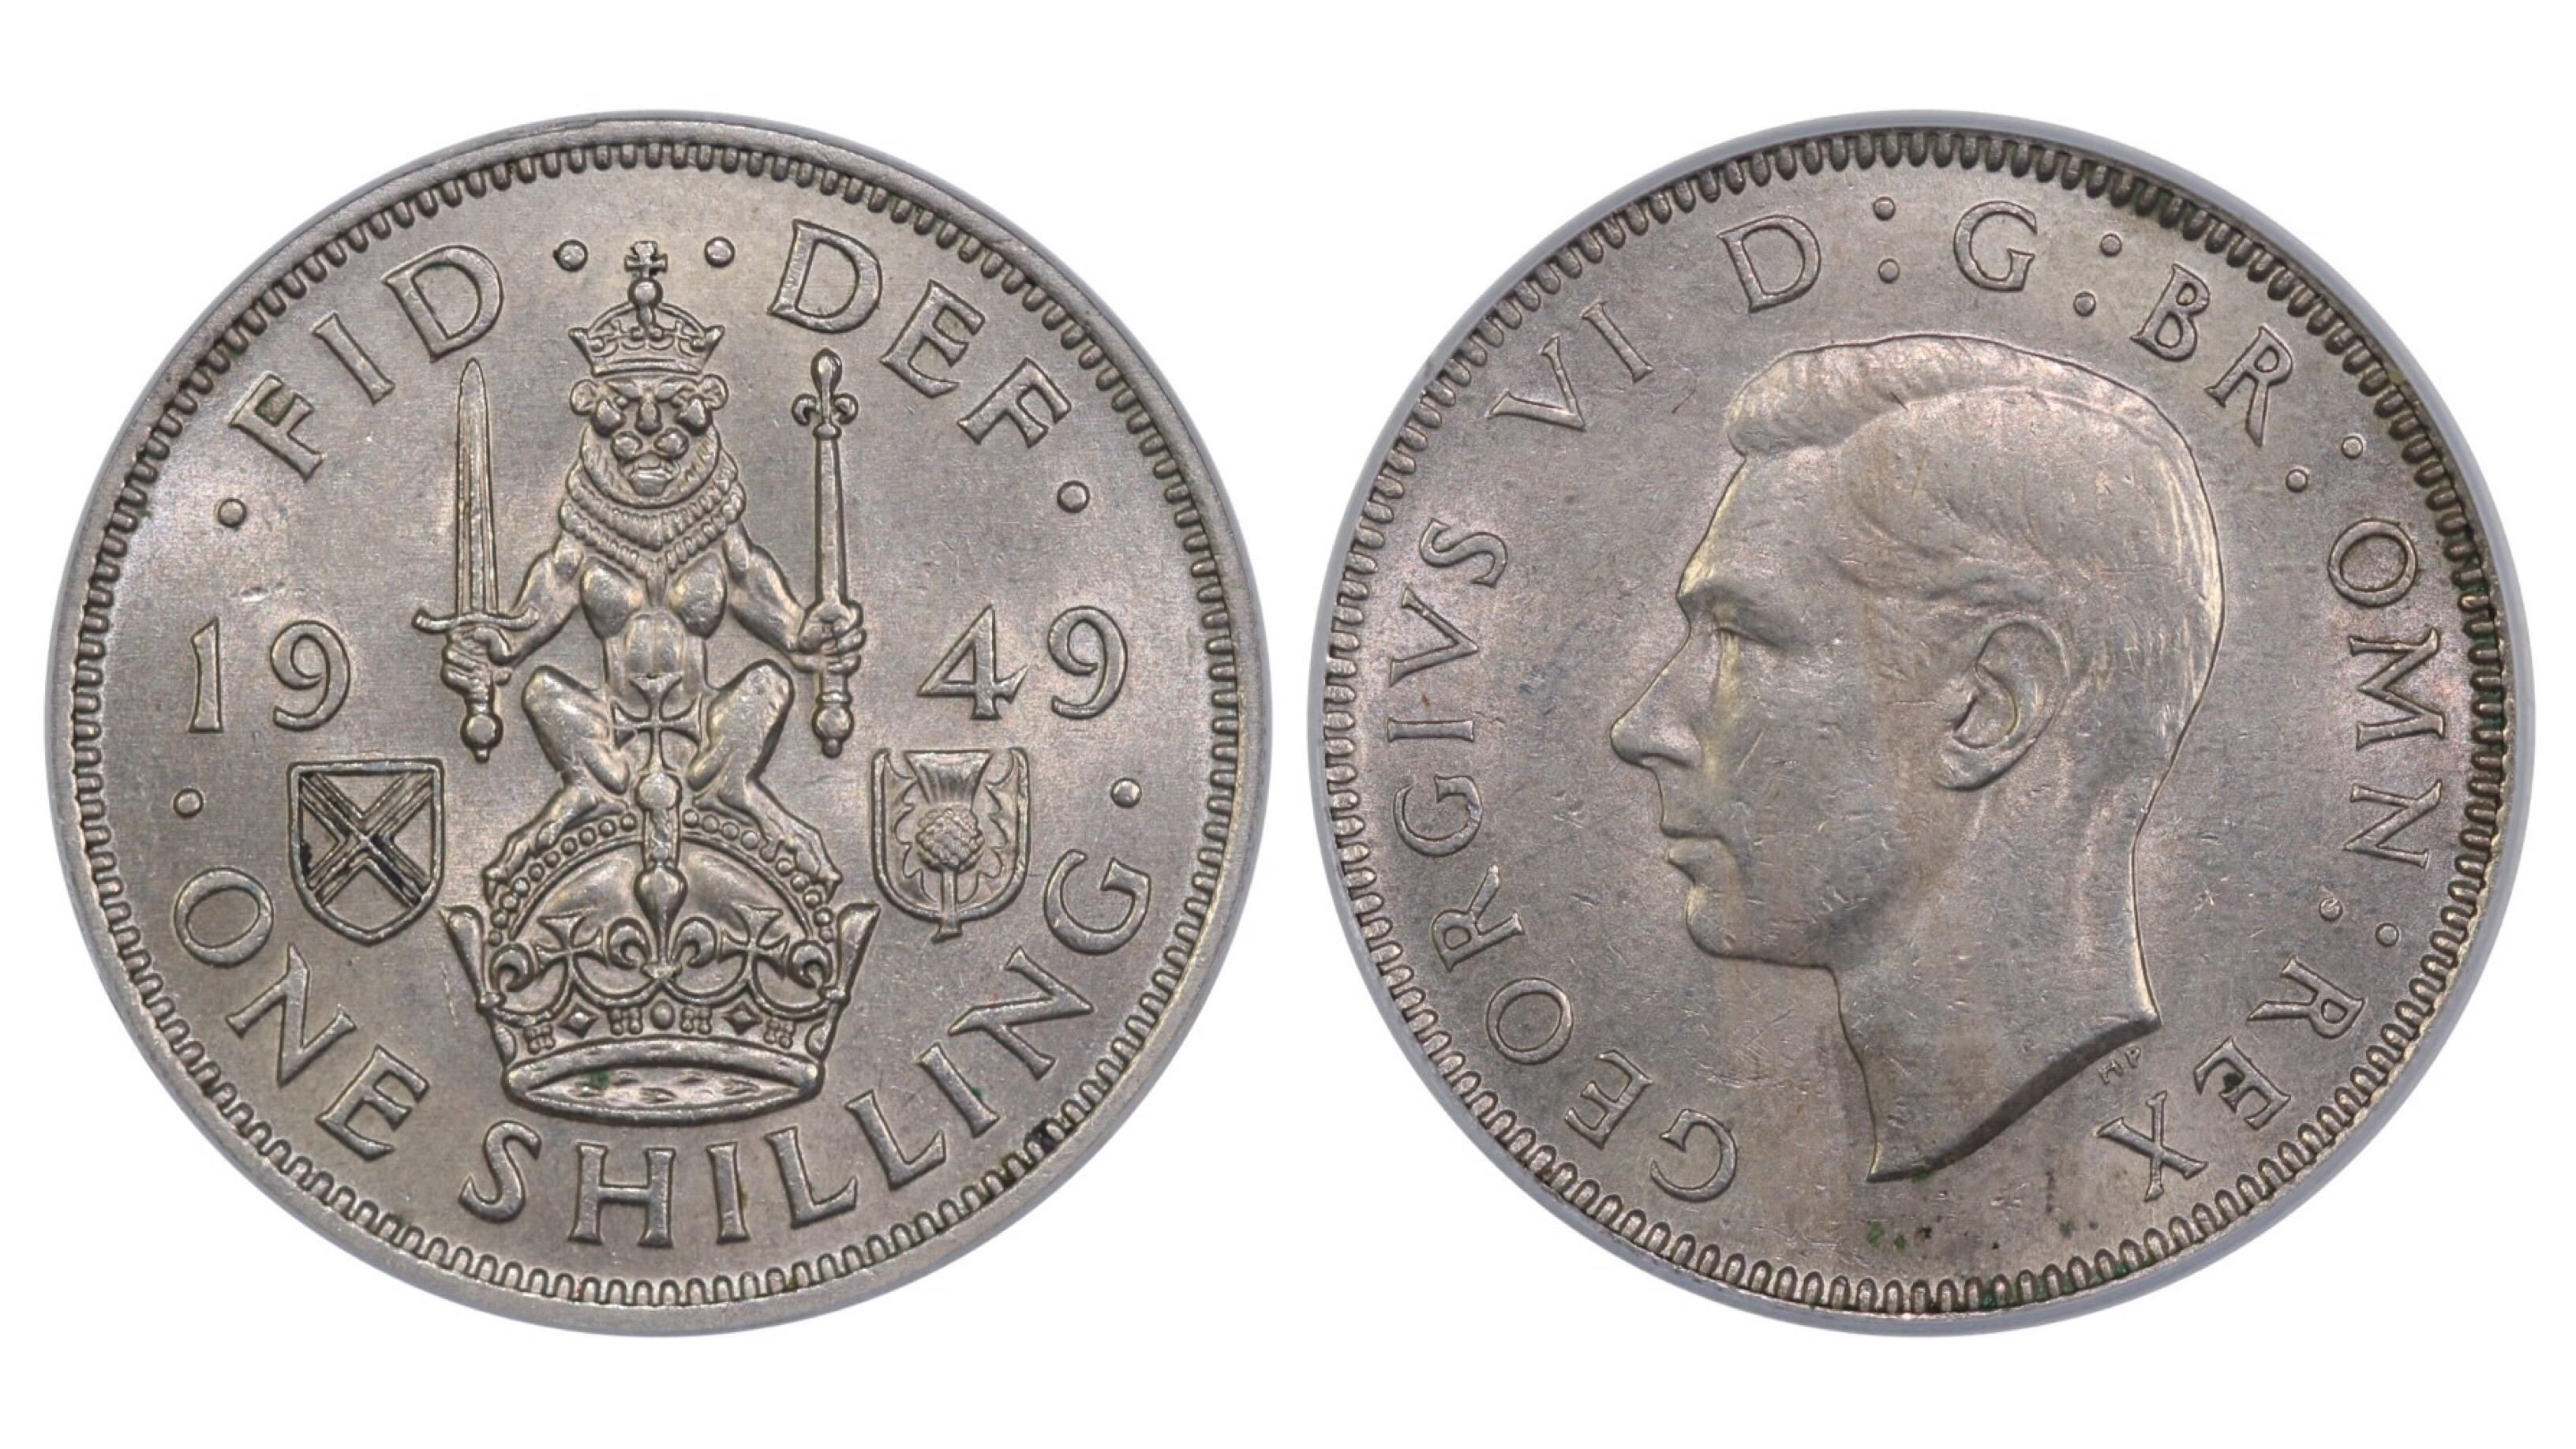 1949 'Scottish' Shilling, CGS 65, George VI, ESC 1475B, UIN 21686